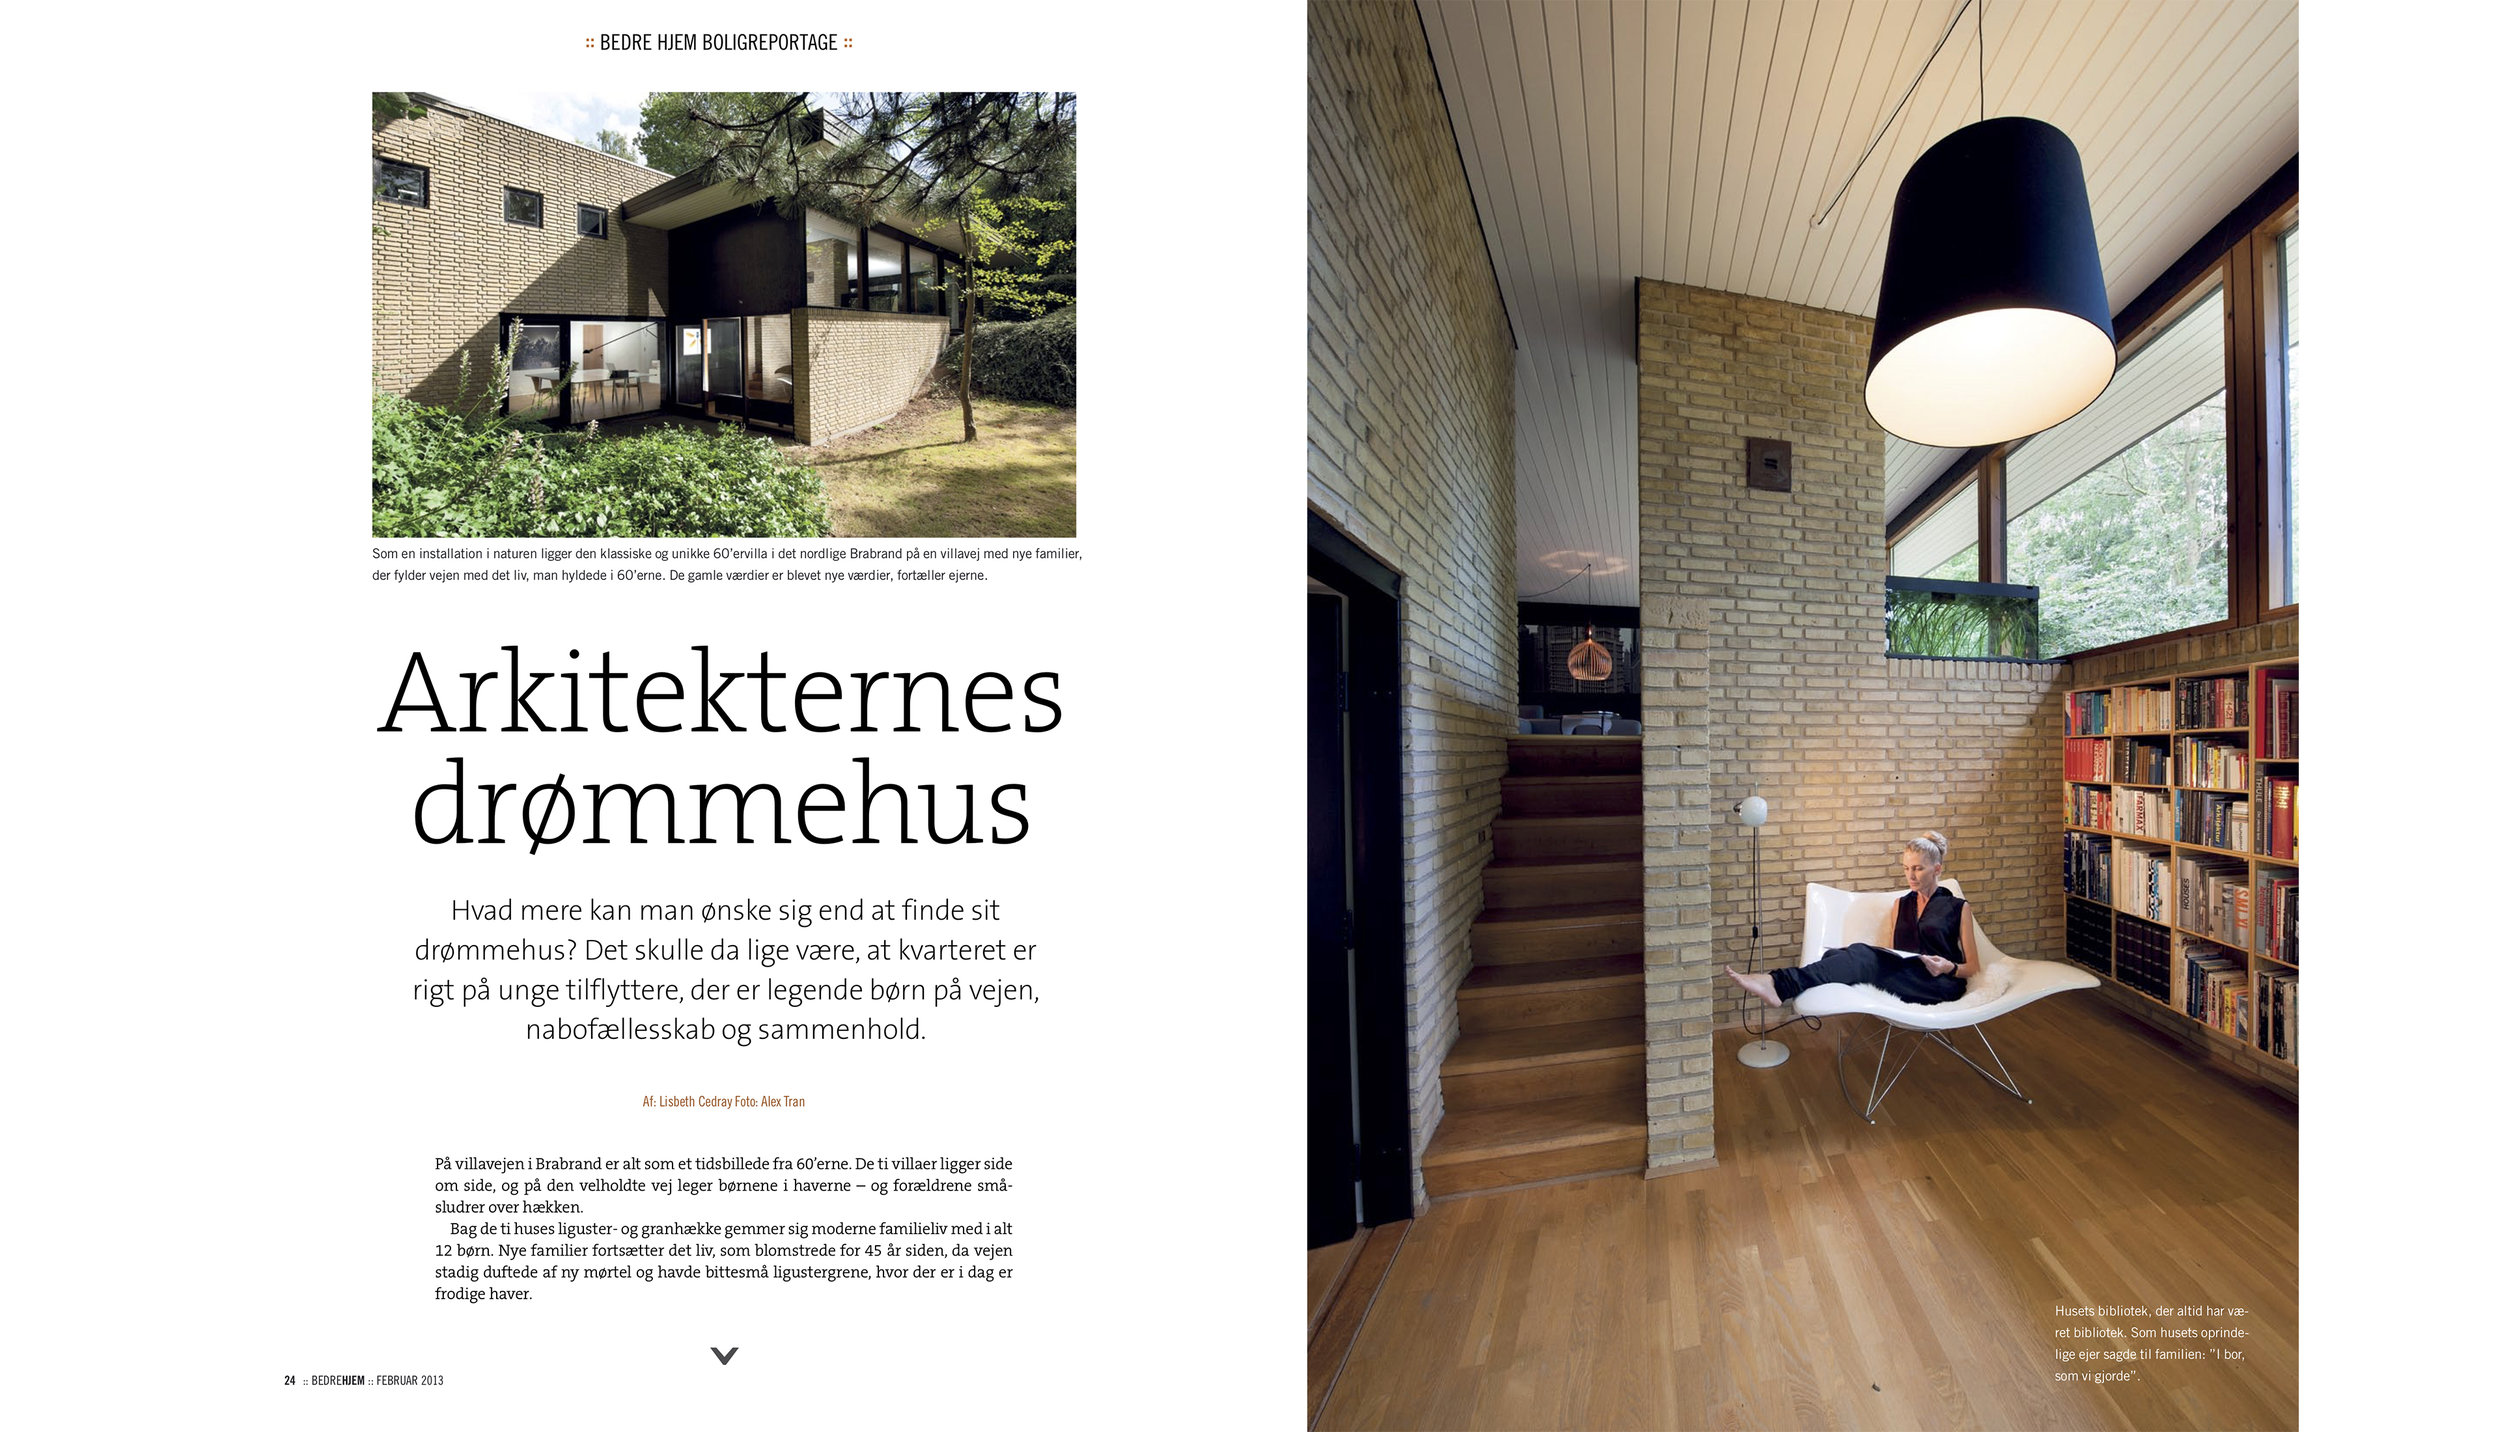 sofie-ladefoged-press-bolius-2013-page-02.jpg